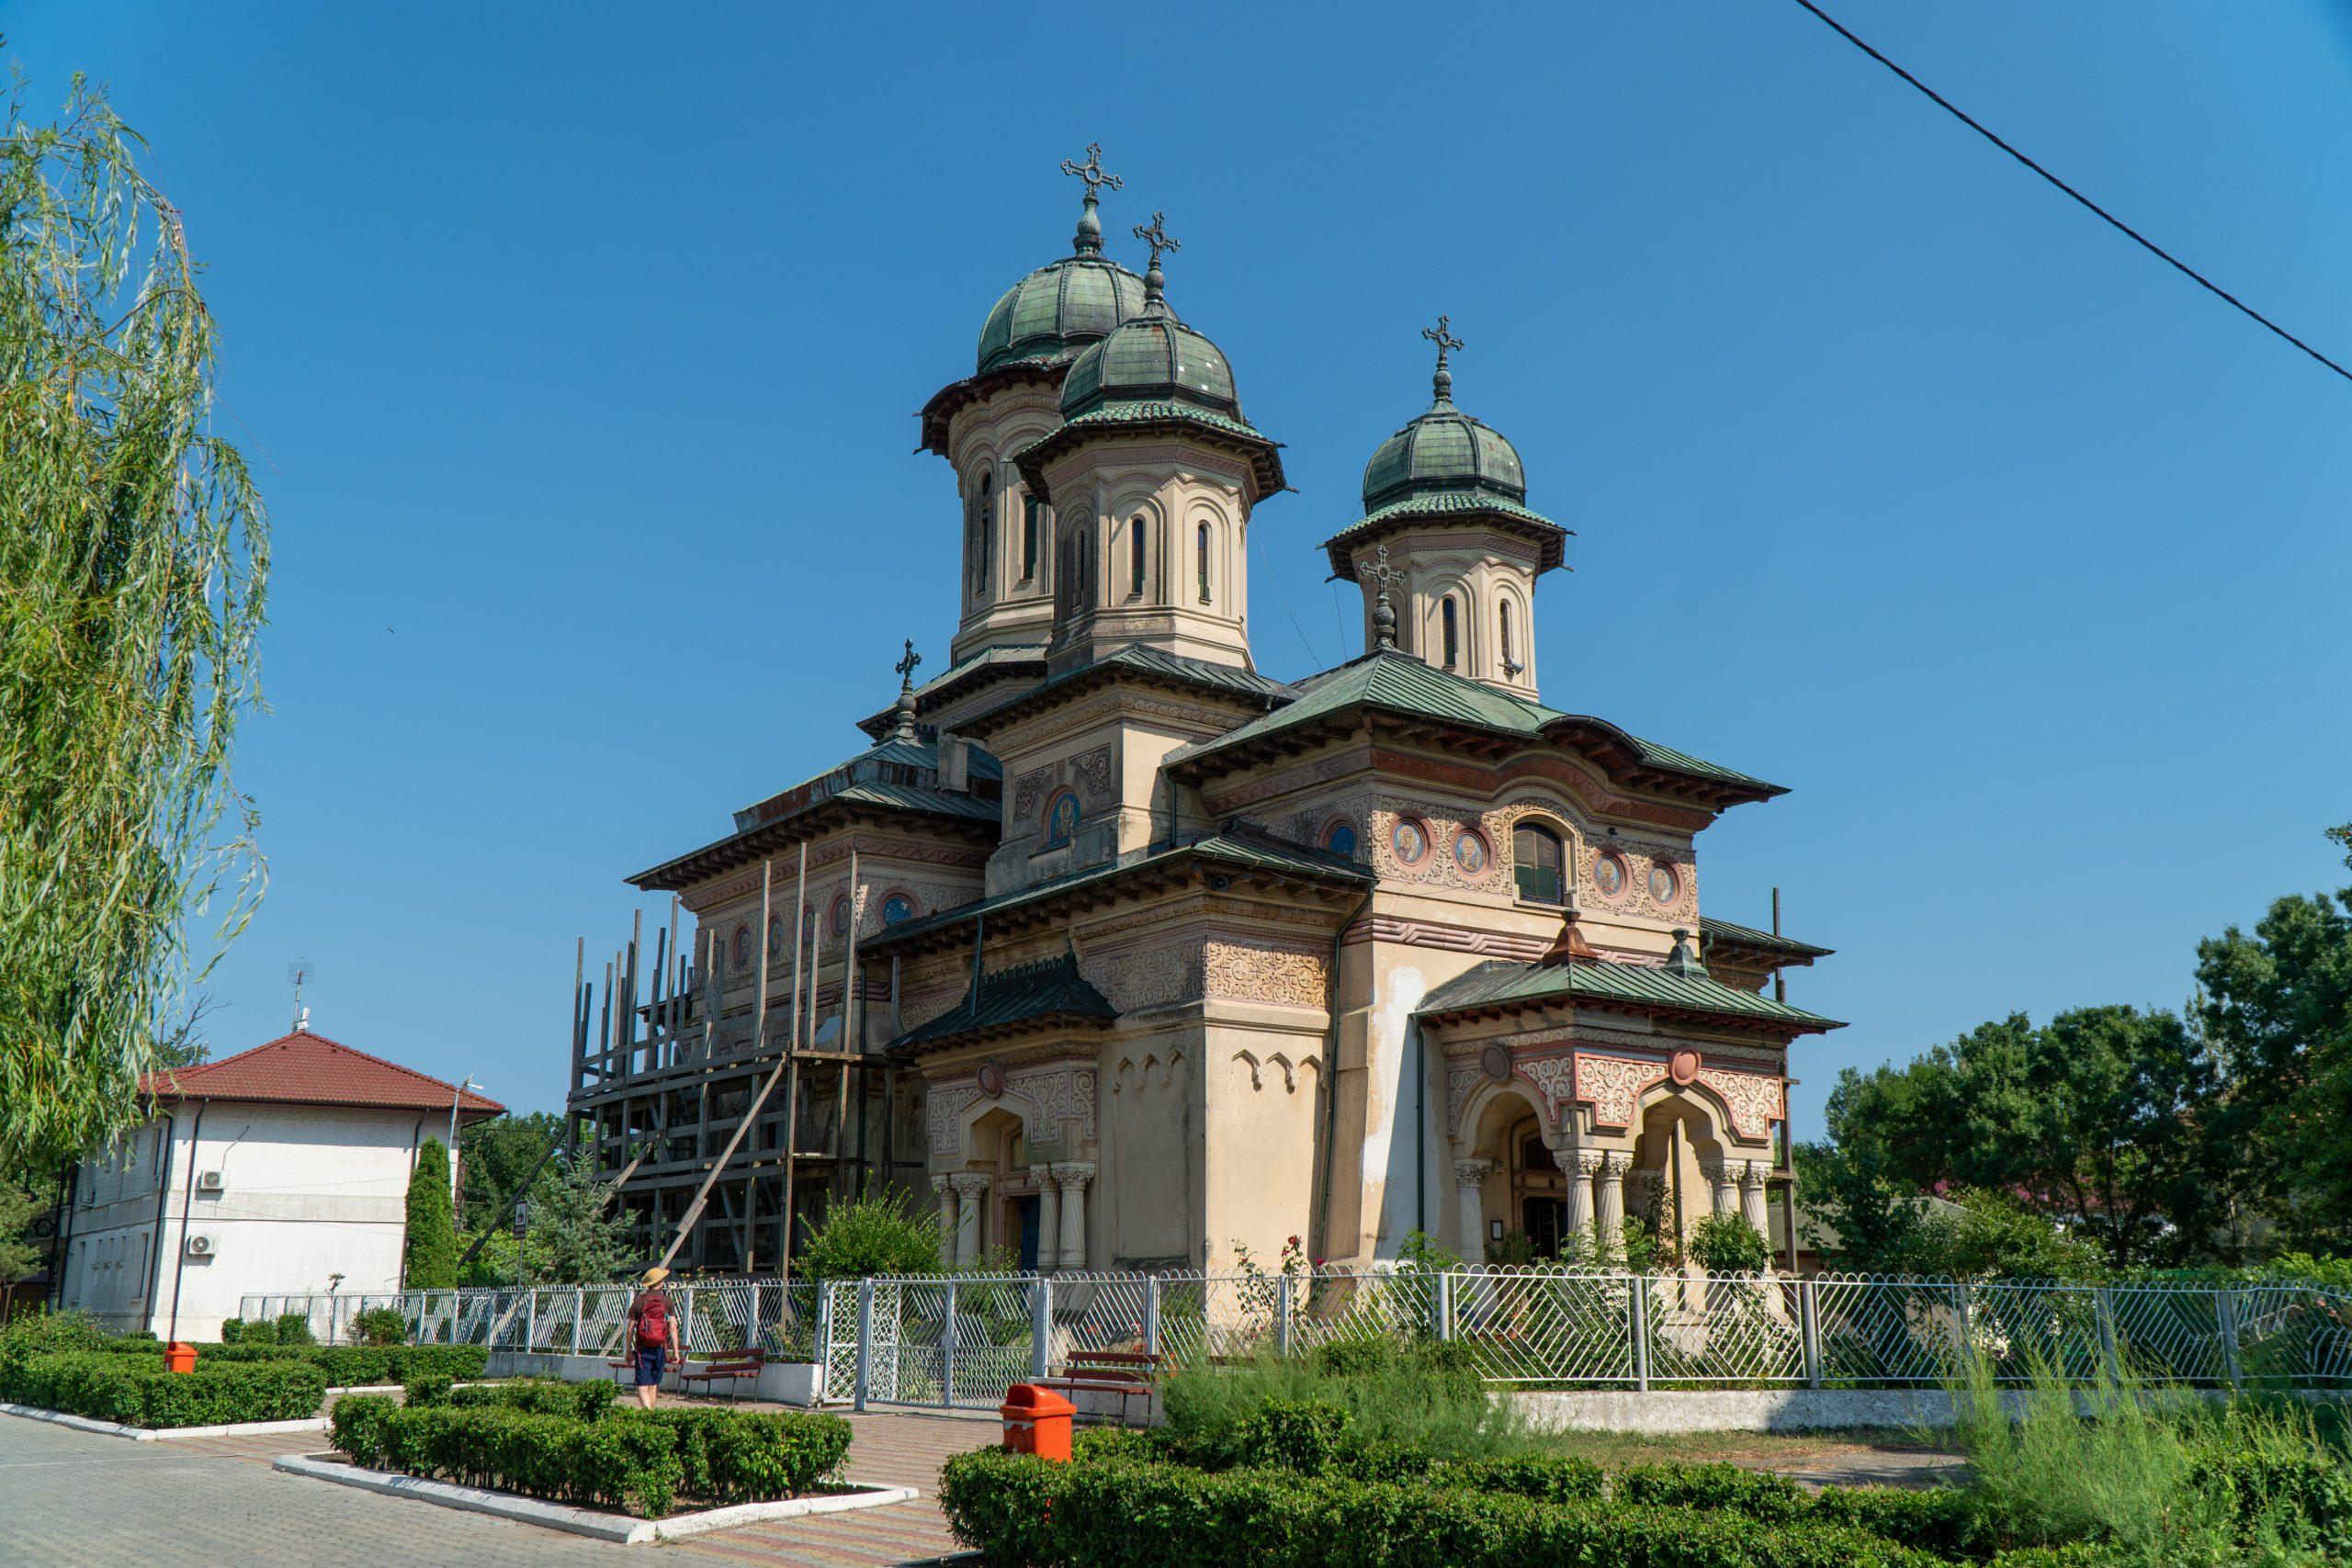 Saint Nicholas Church in Sulina